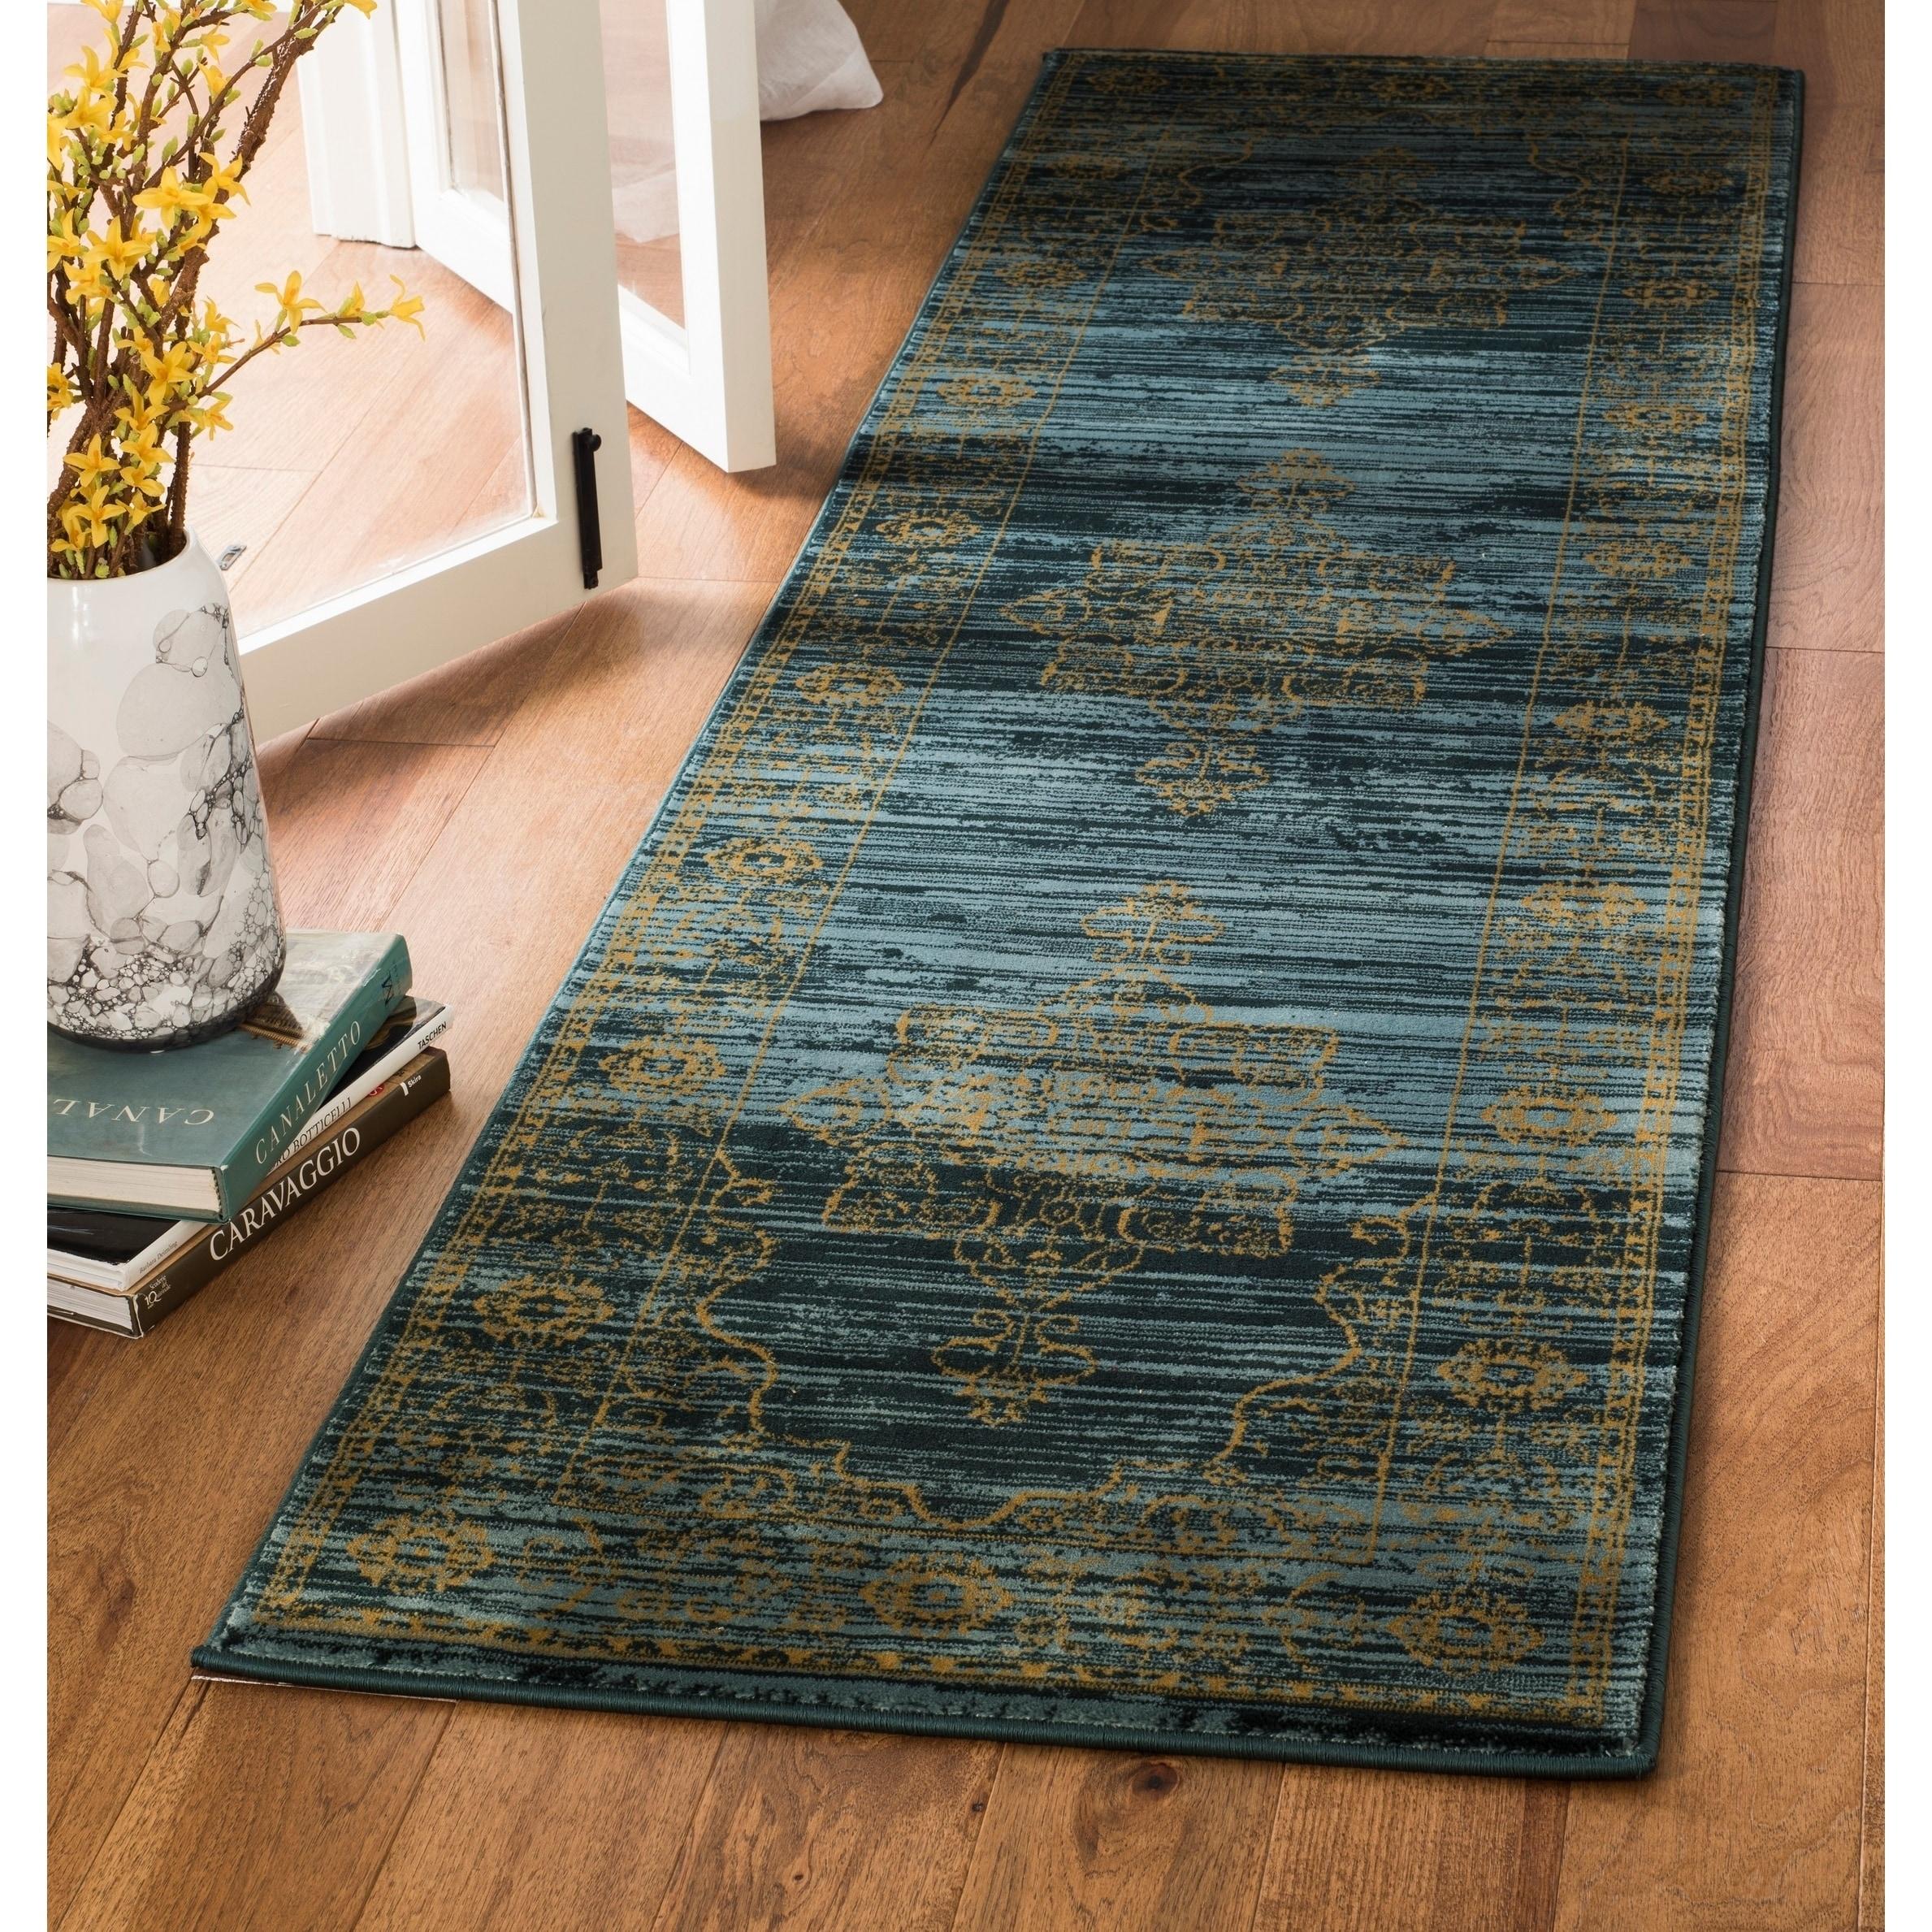 Safavieh Serenity Transitional Oriental Turquoise/ Gold R...